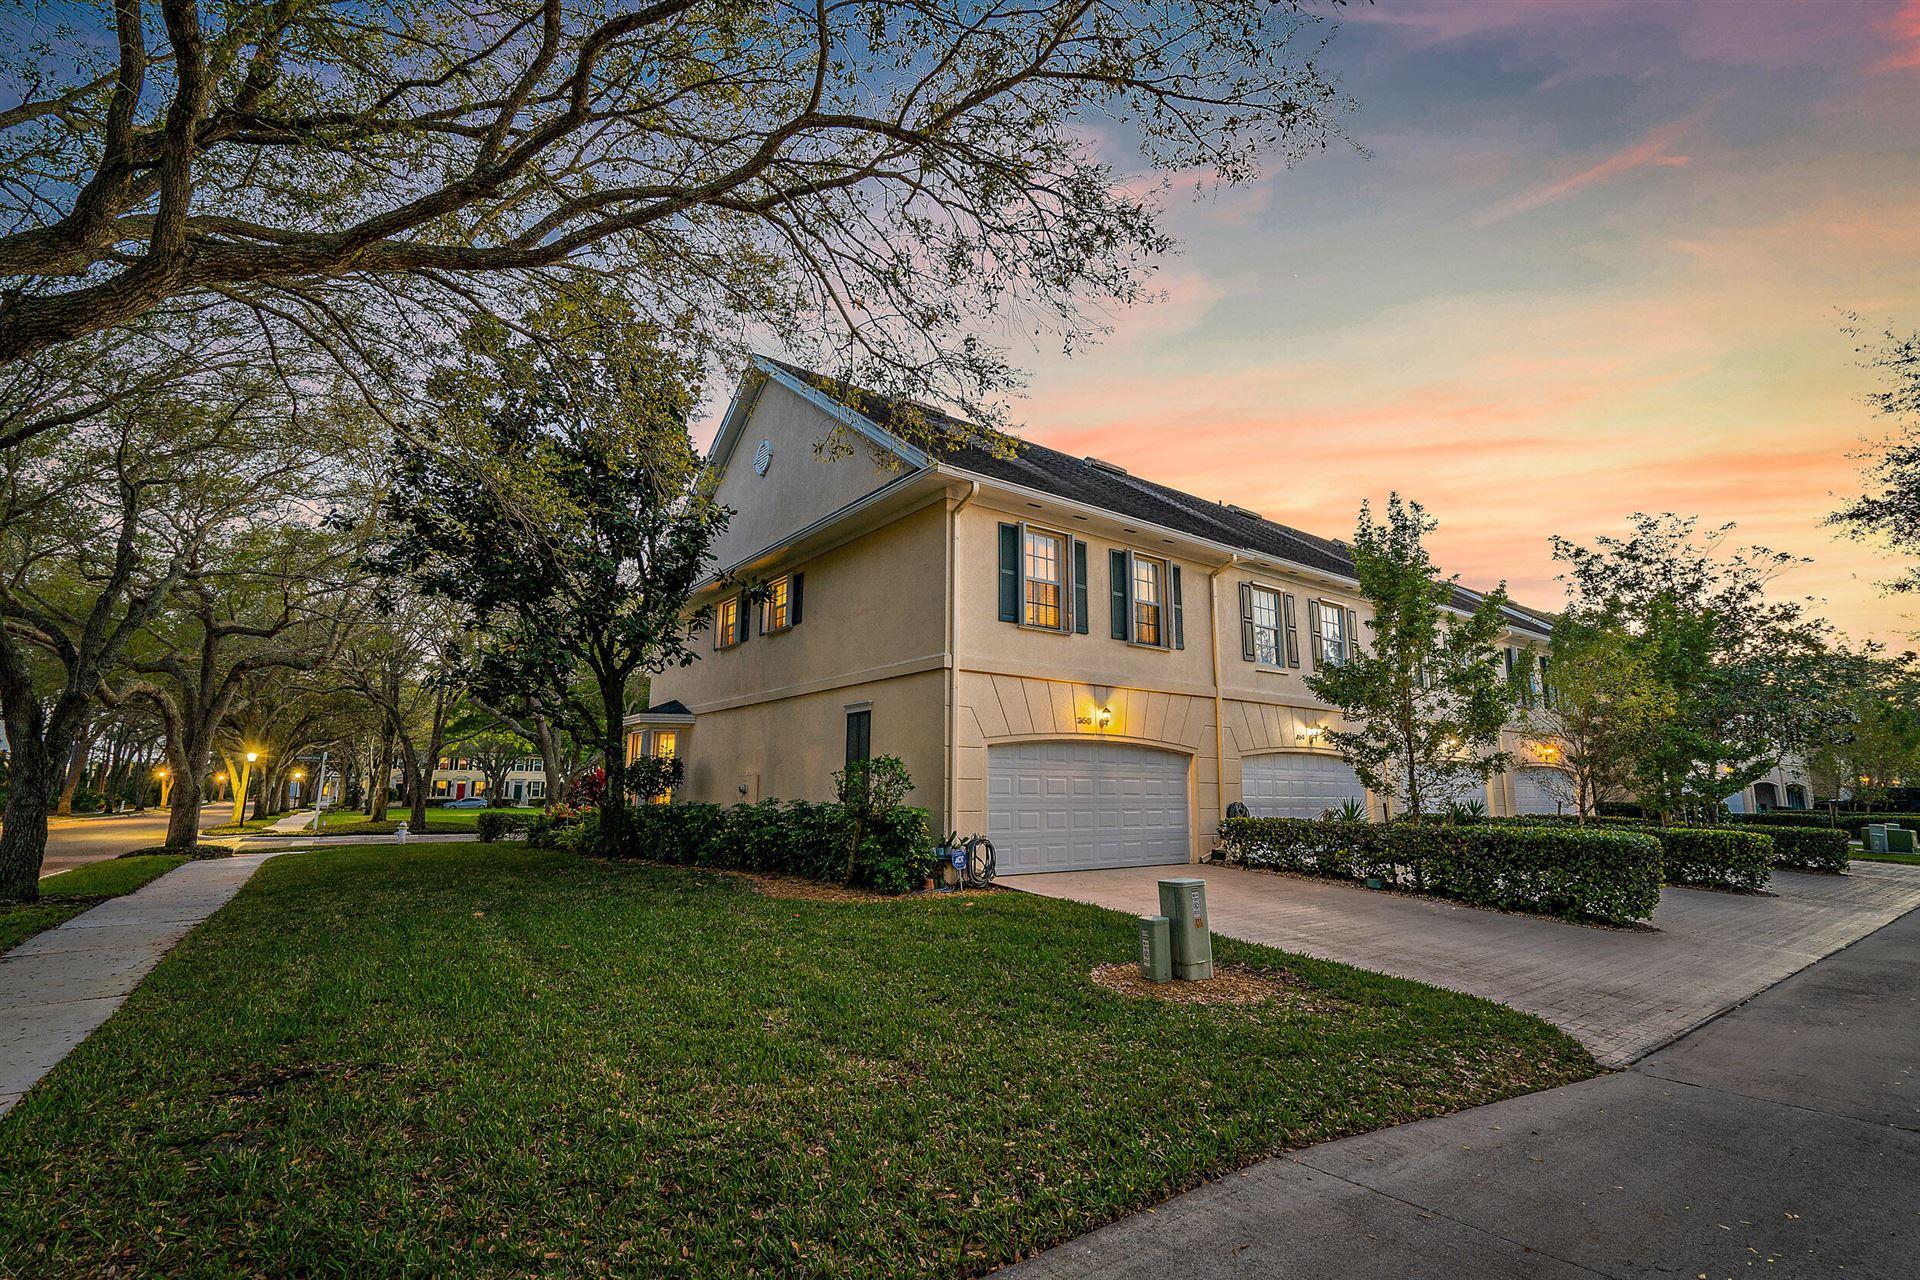 Photo of 356 Jacaranda Drive, Jupiter, FL 33458 (MLS # RX-10693810)